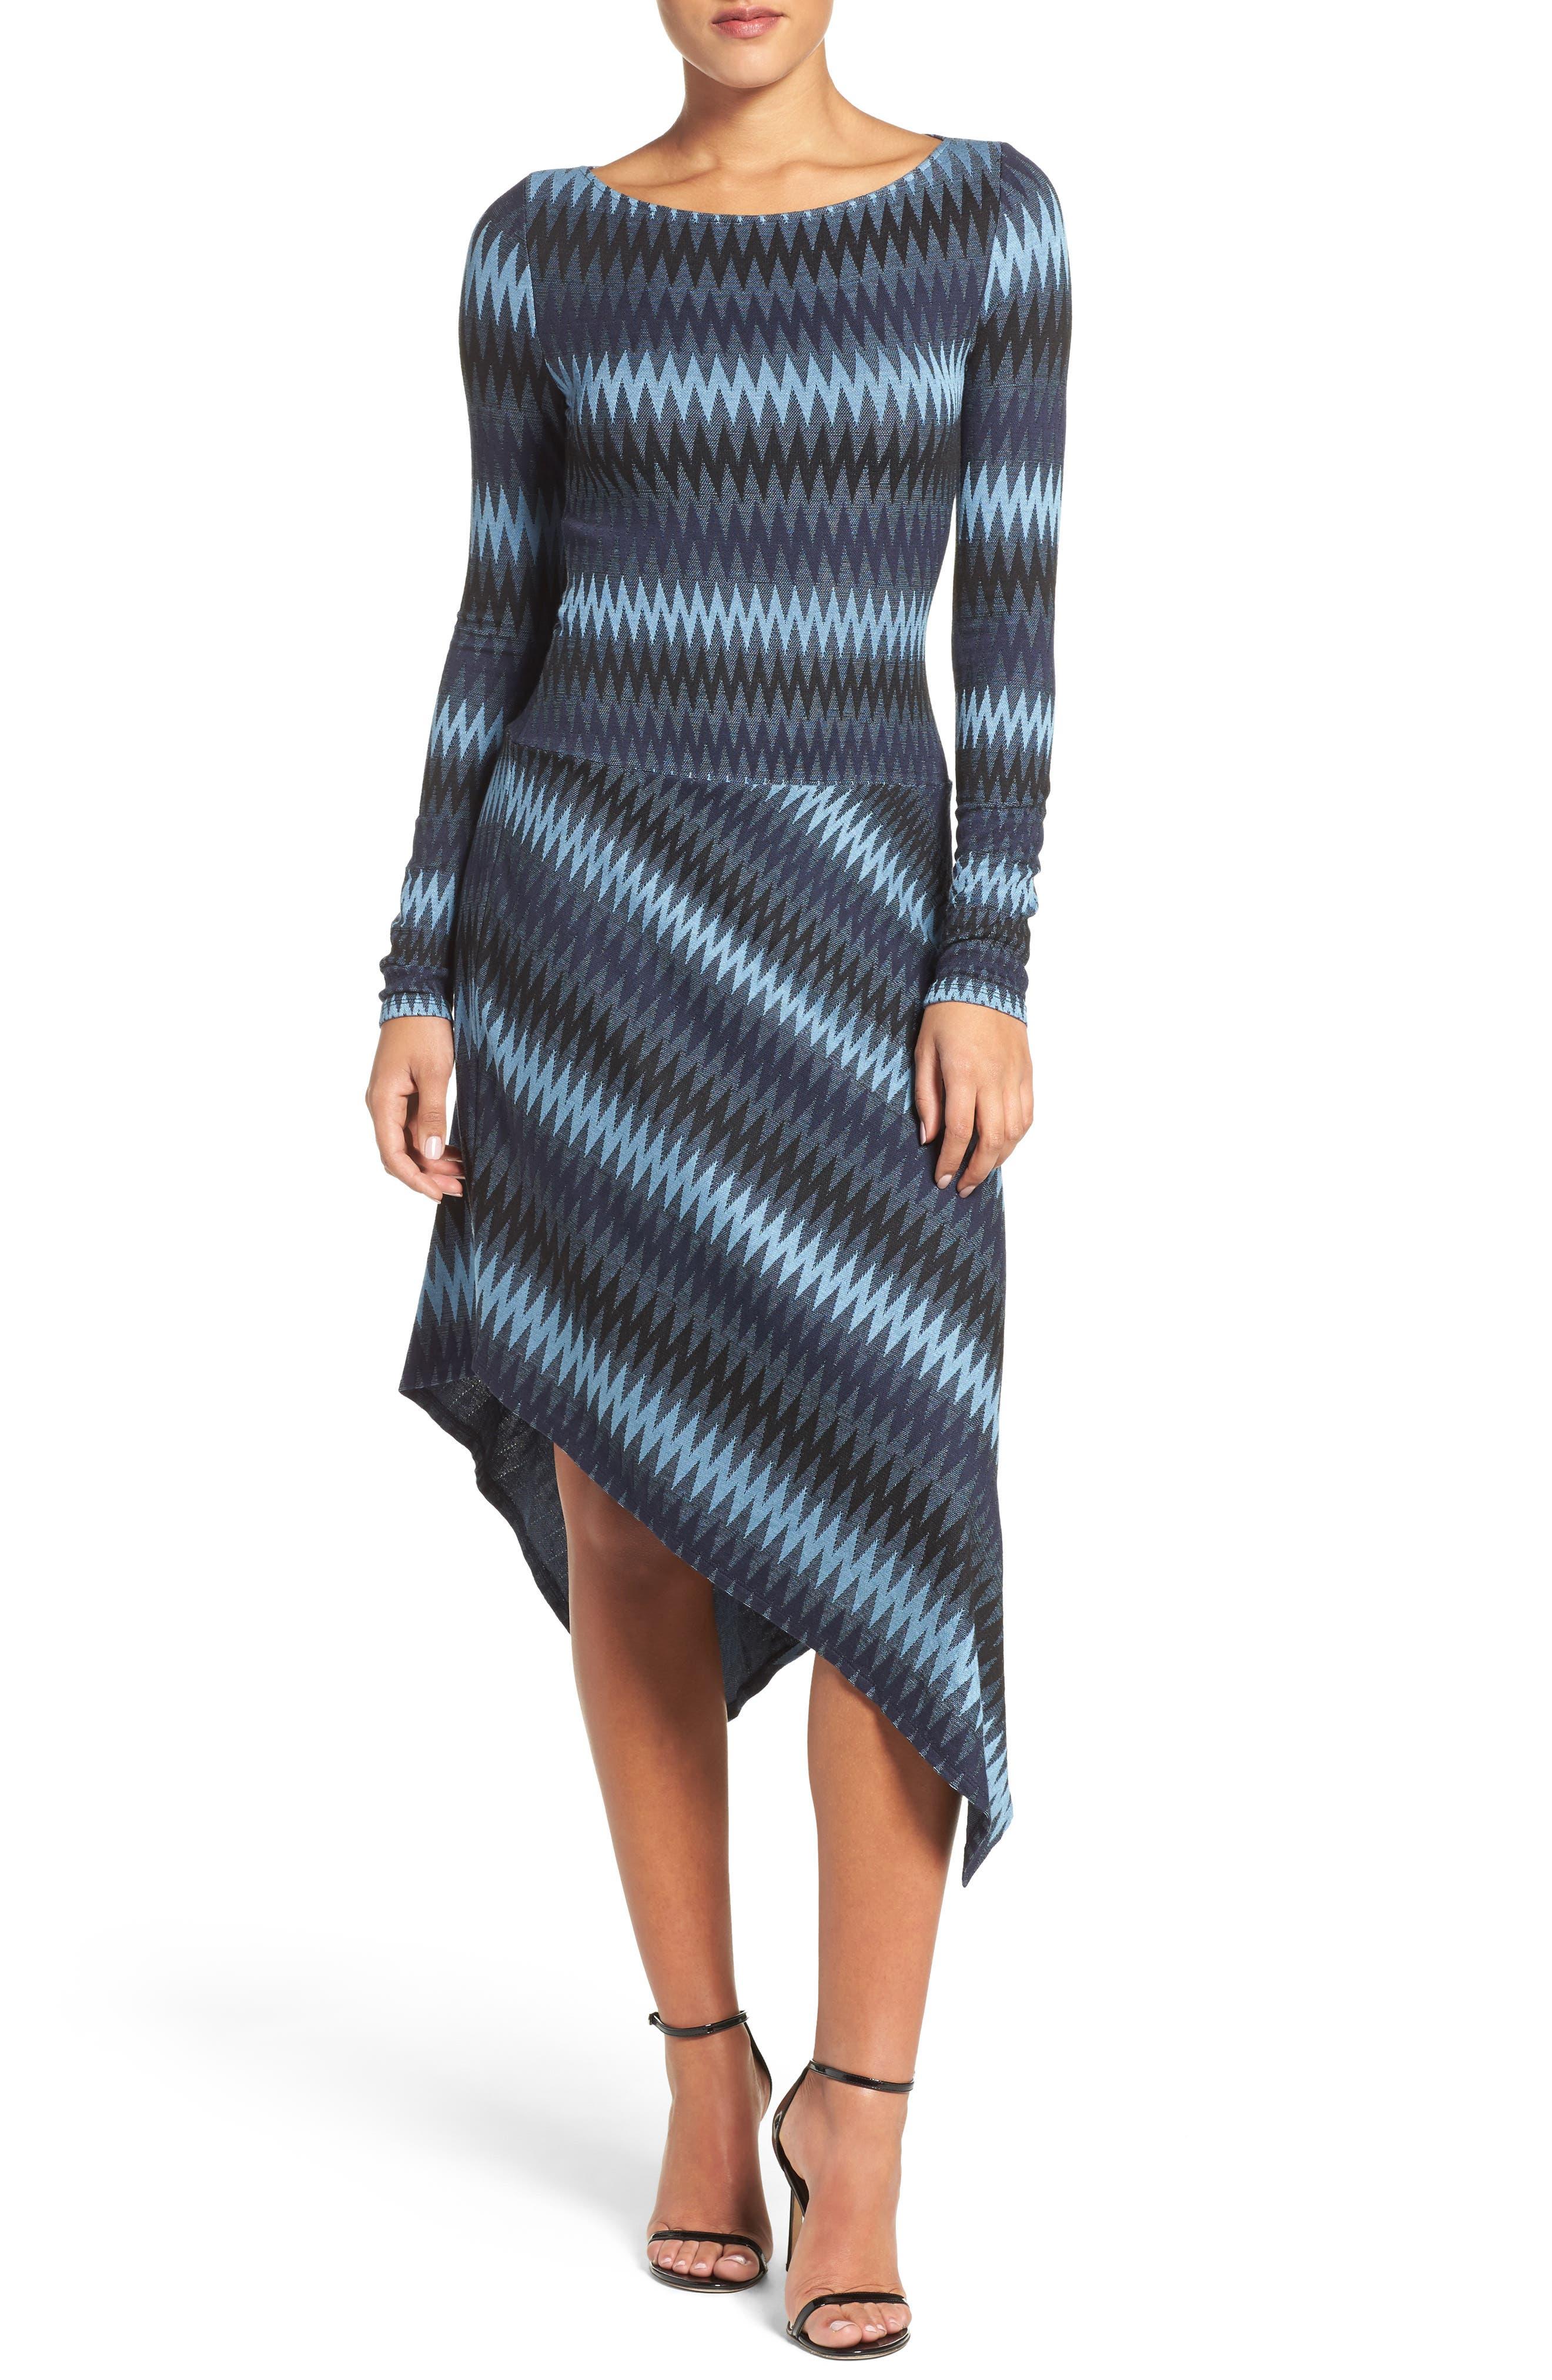 Main Image - BCBGMAXAZRIA Asymmetrical Knit Dress